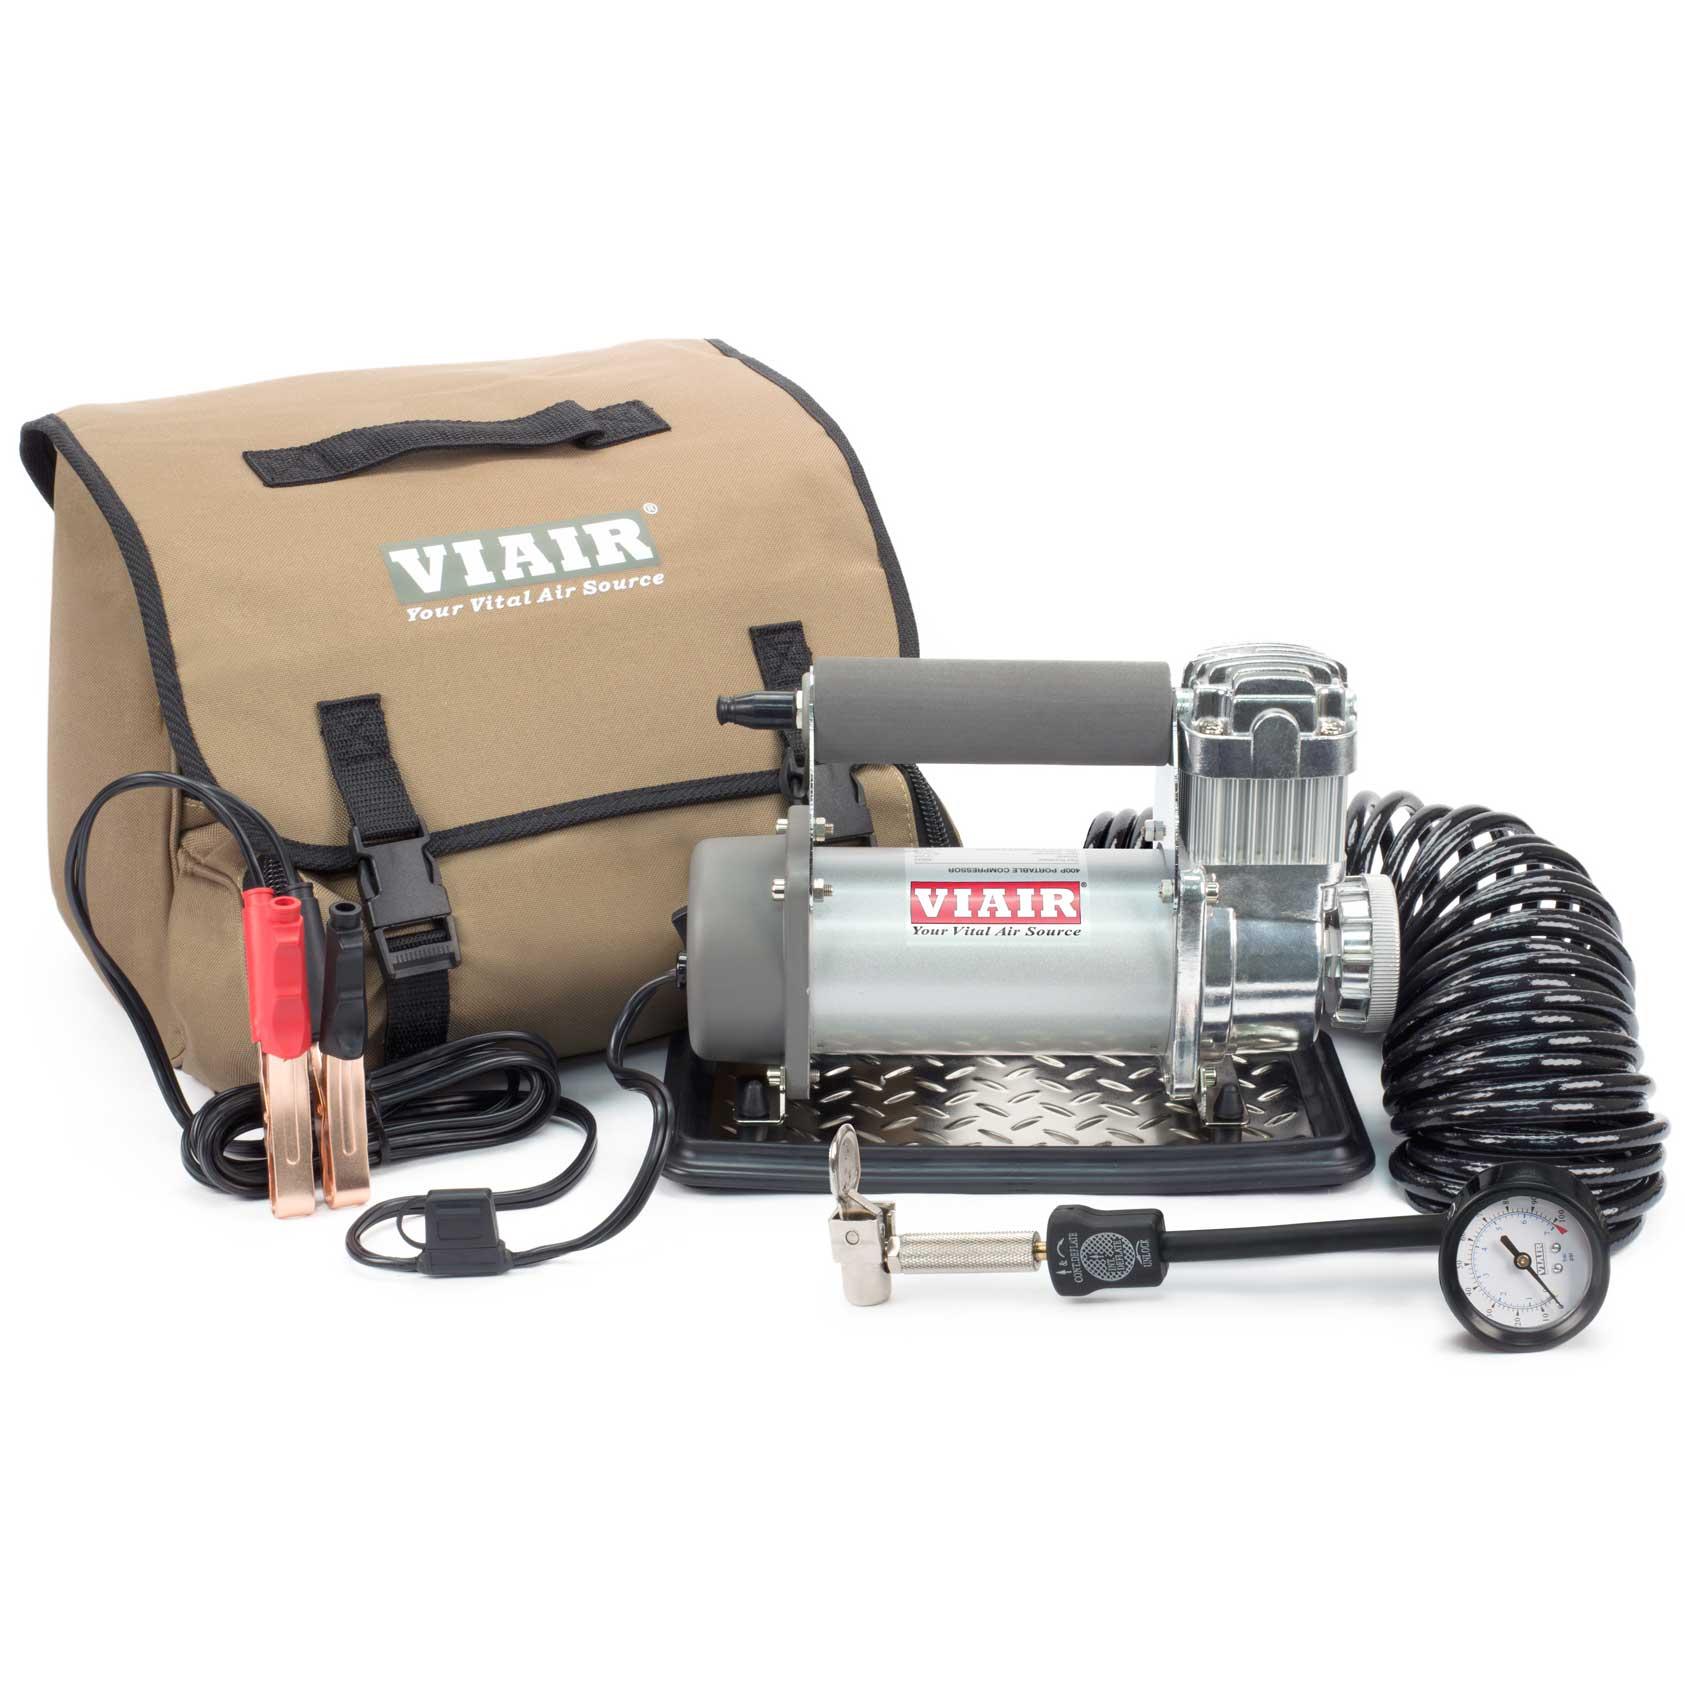 Viar Portable Compressor Kit